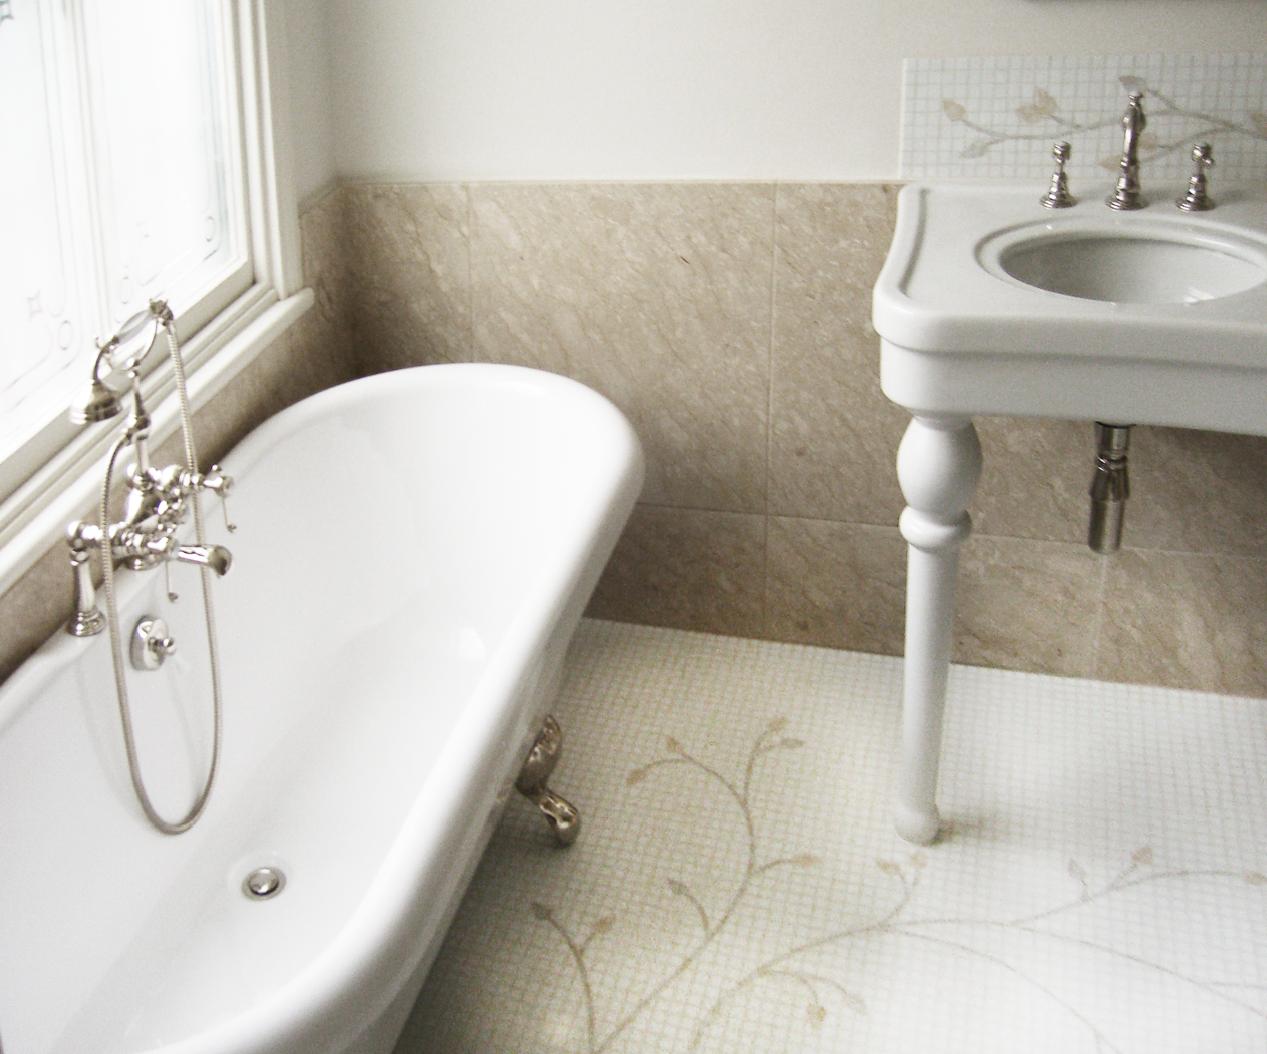 Nickel footed claw foot bath, hand made mosaic floors, ceramic basins